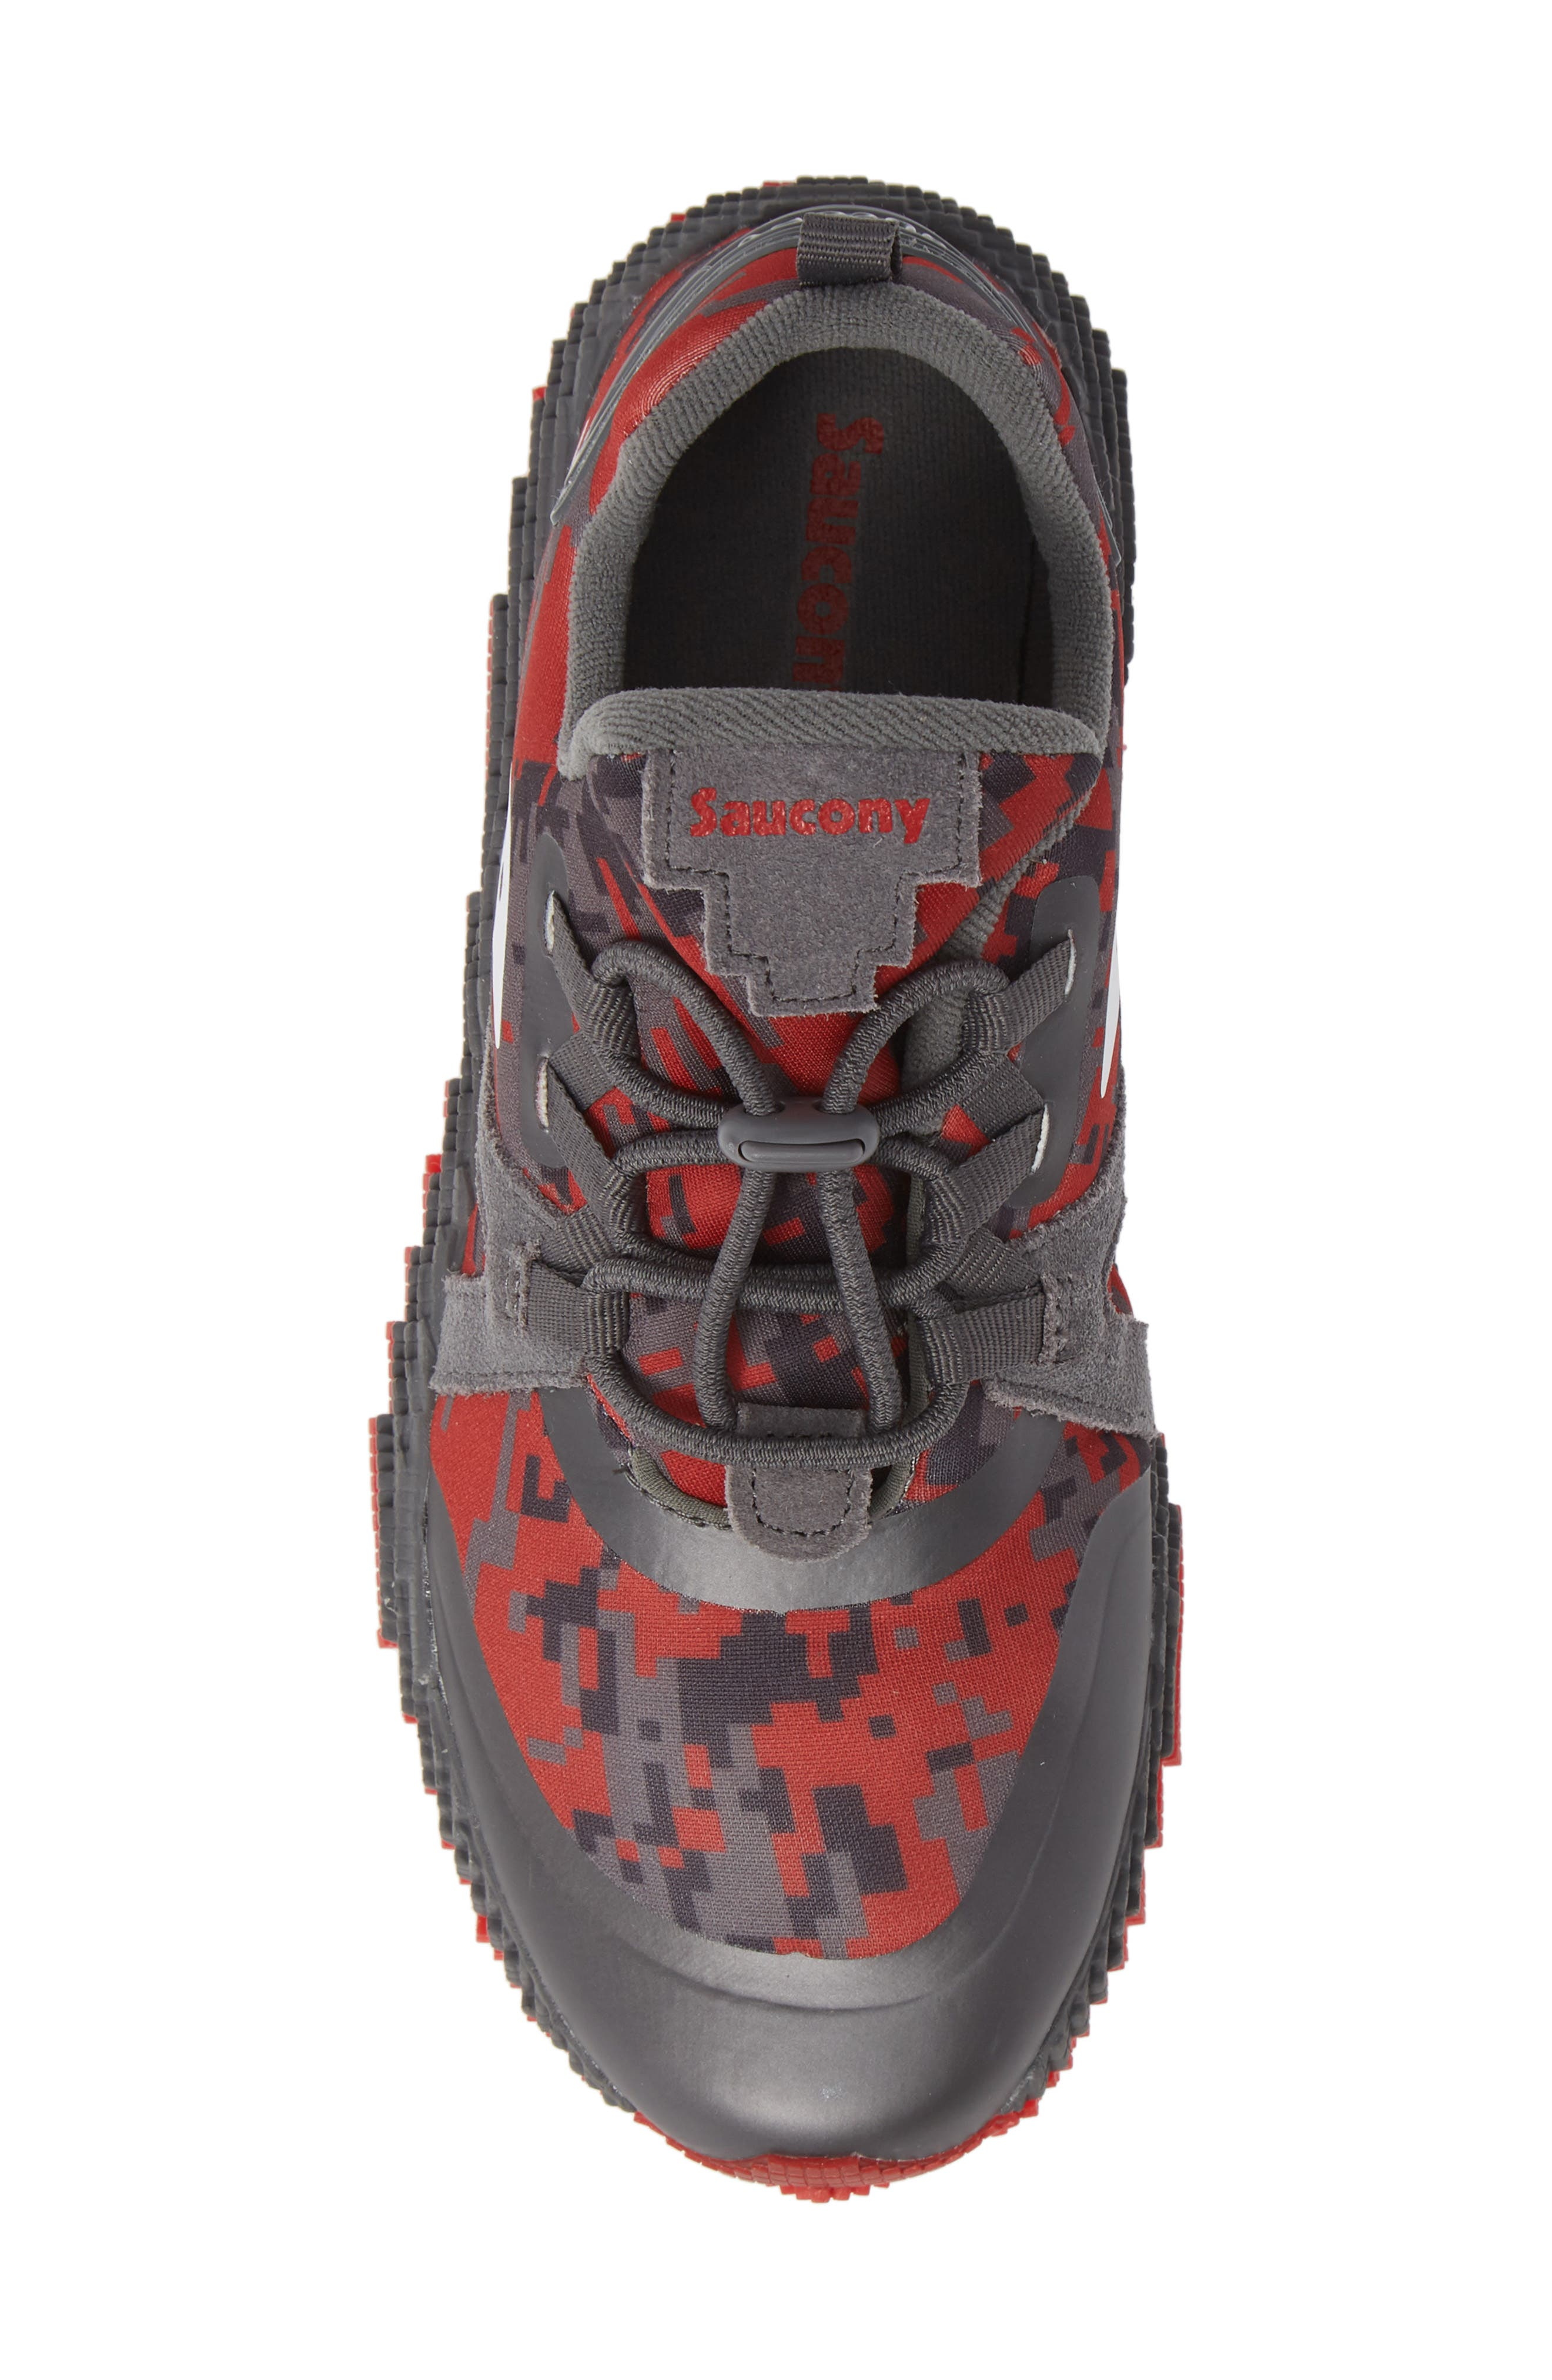 Voxel 9000 Sneaker,                             Alternate thumbnail 6, color,                             GREY LEATHER/ MESH 2